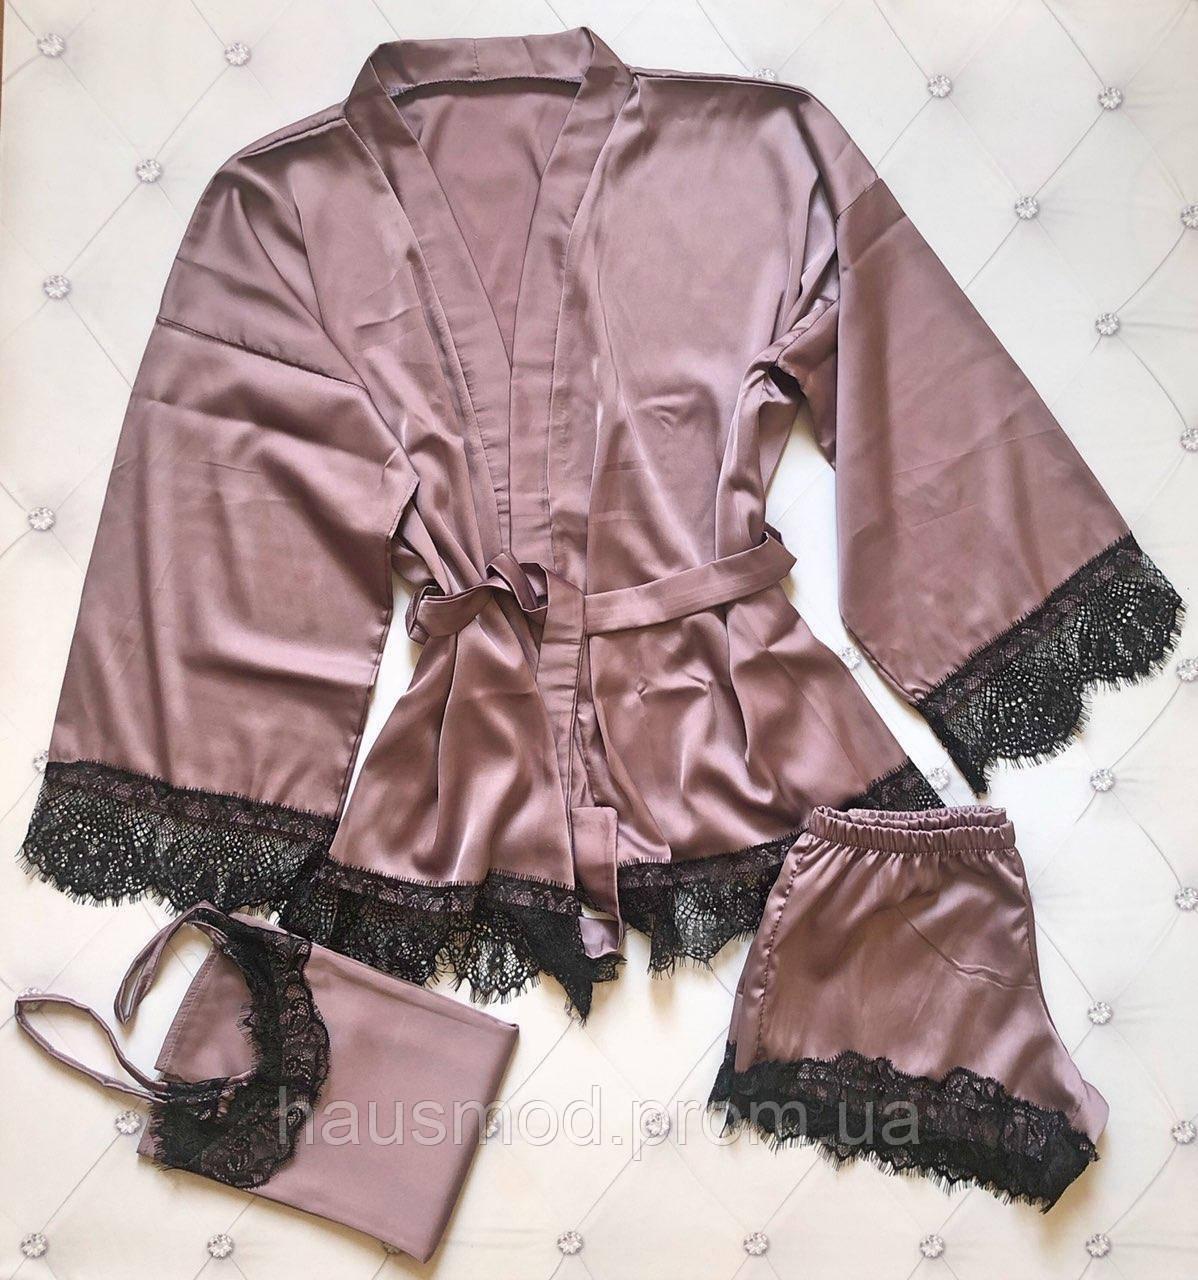 Женский комплект для сна 3-ка топ шорты халат ткань армани шелк кружево цвет мокко